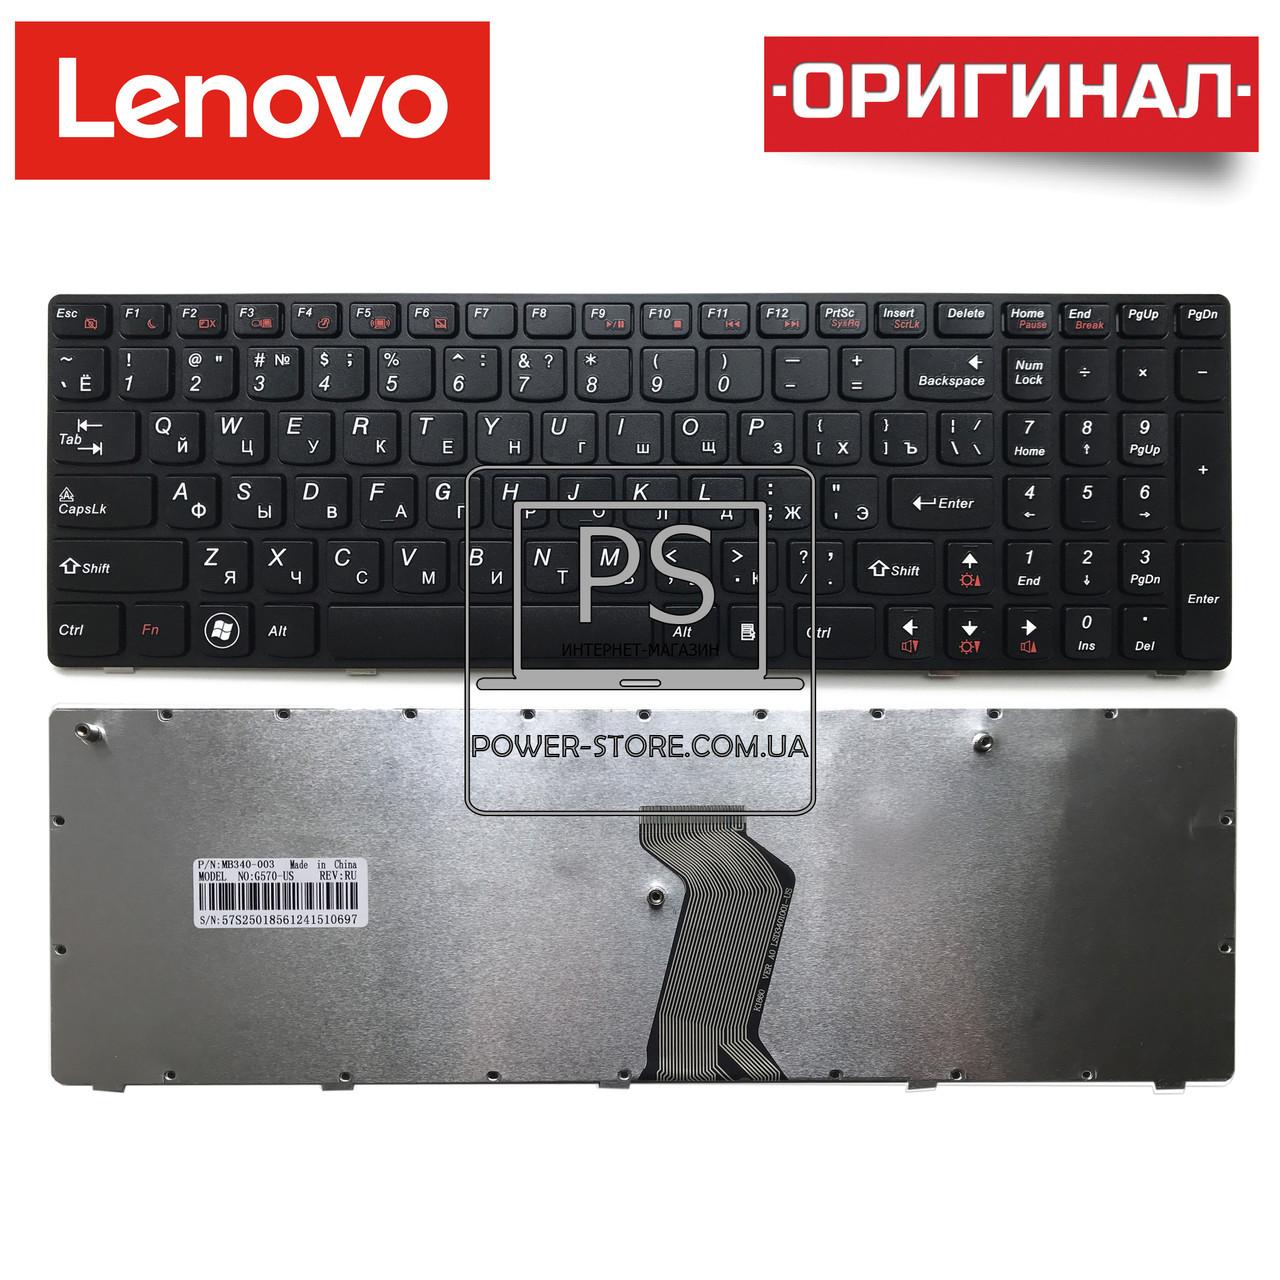 Клавиатура  для ноутбука LENOVO  25-012338, 25-012339, 25-012340, 25-012341, 25-012342,